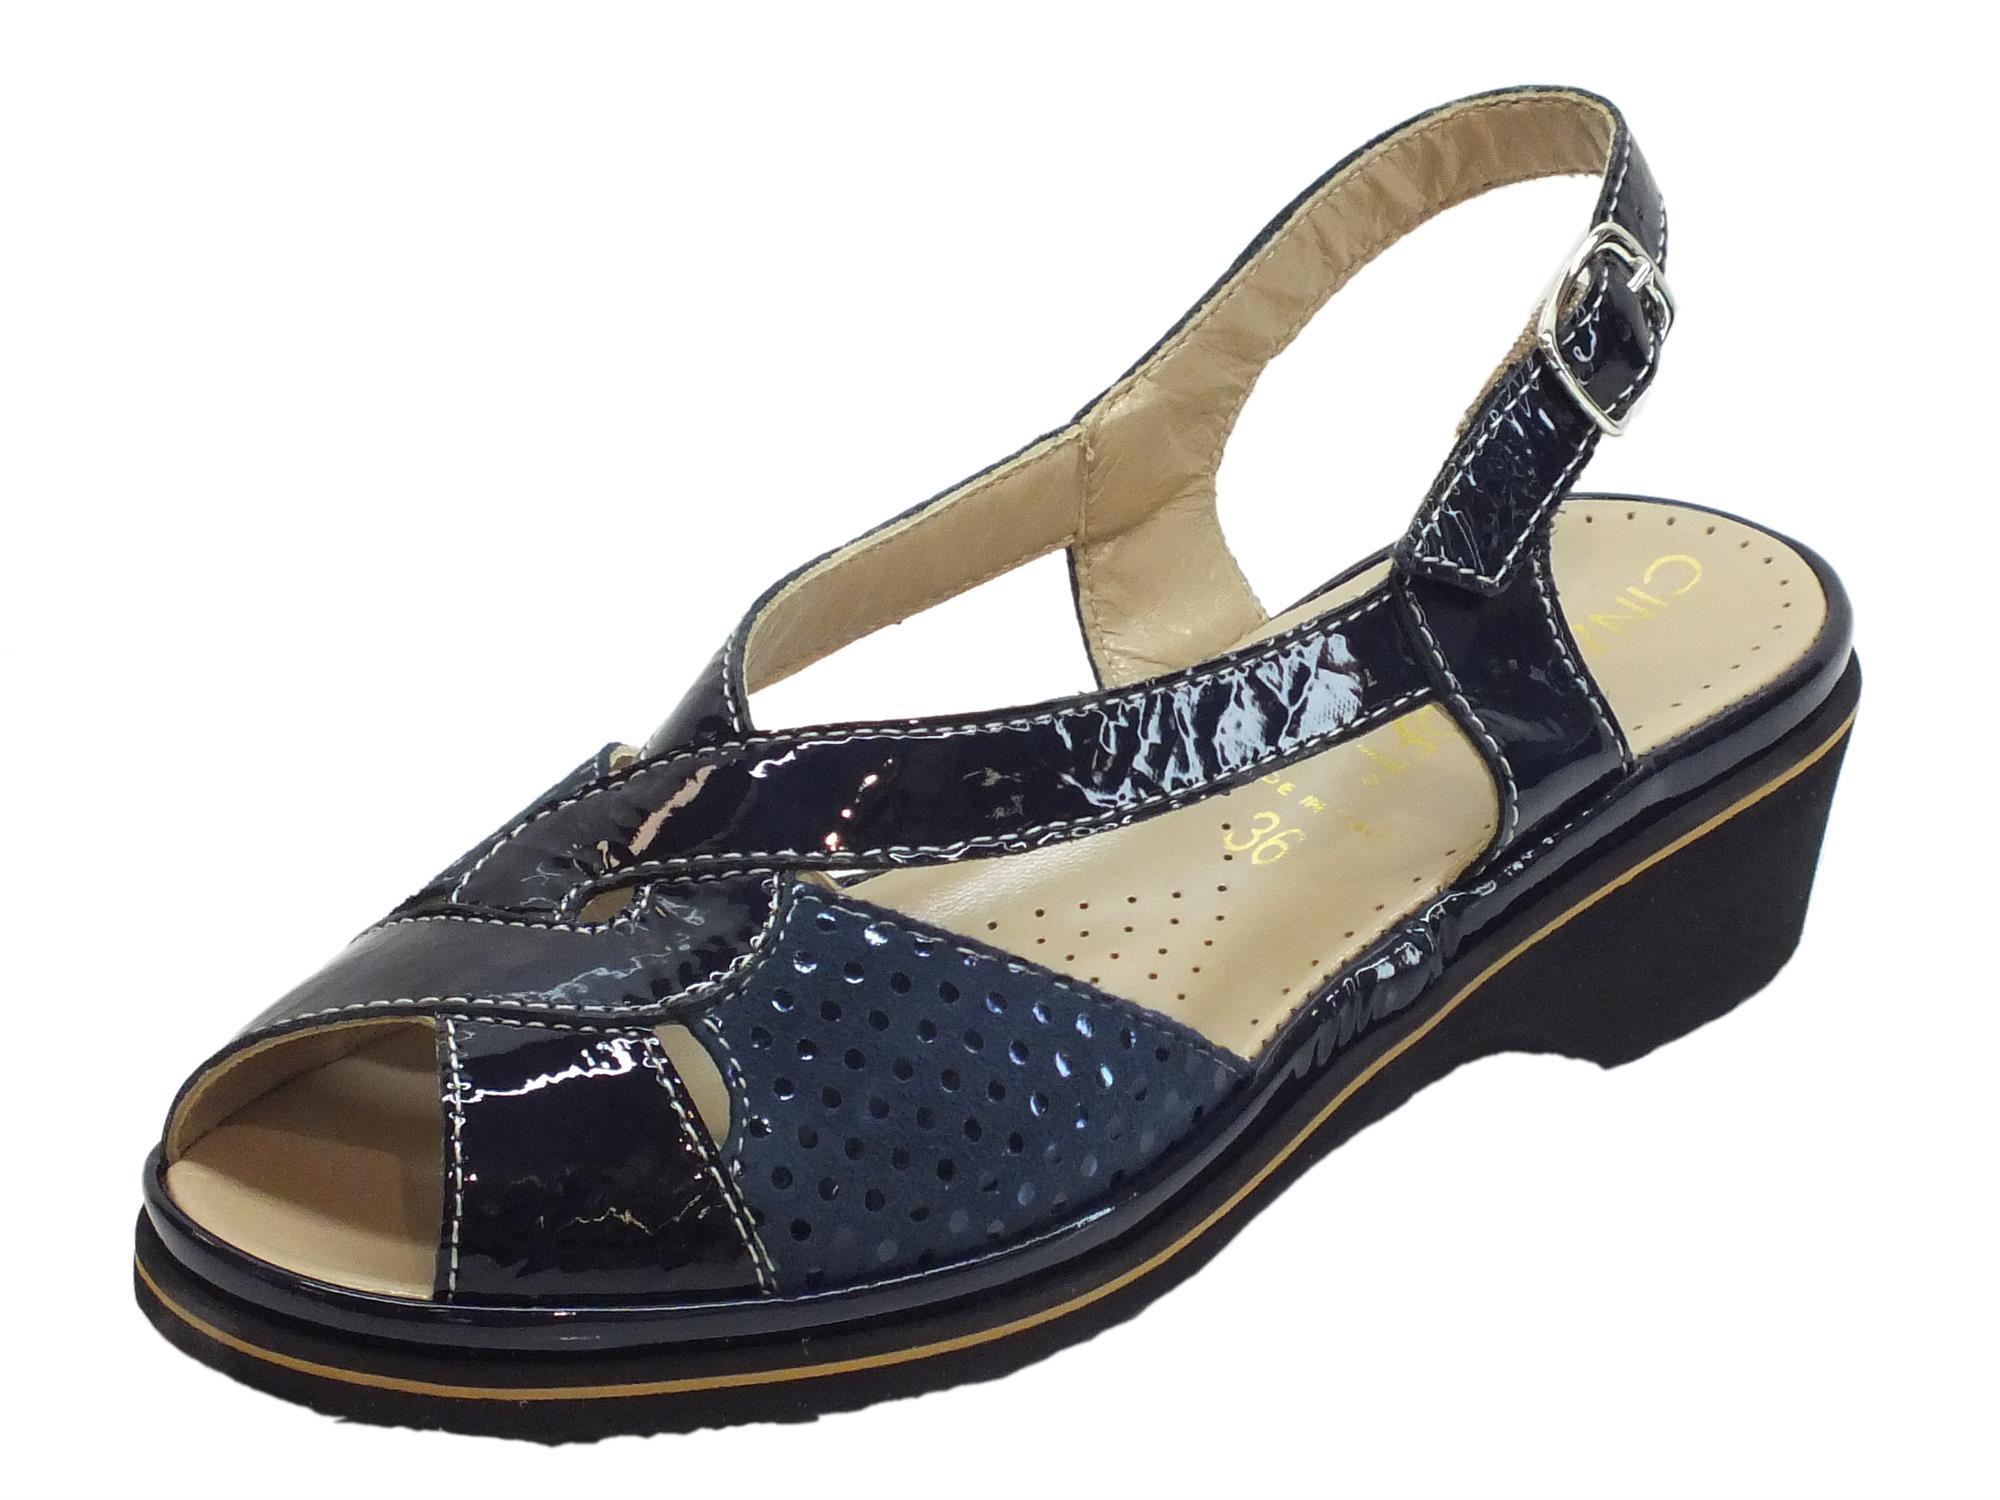 Sandalo blu Cinzia Soft camoscio vernice a pois blu Sandalo zeppa bassa   e0a194